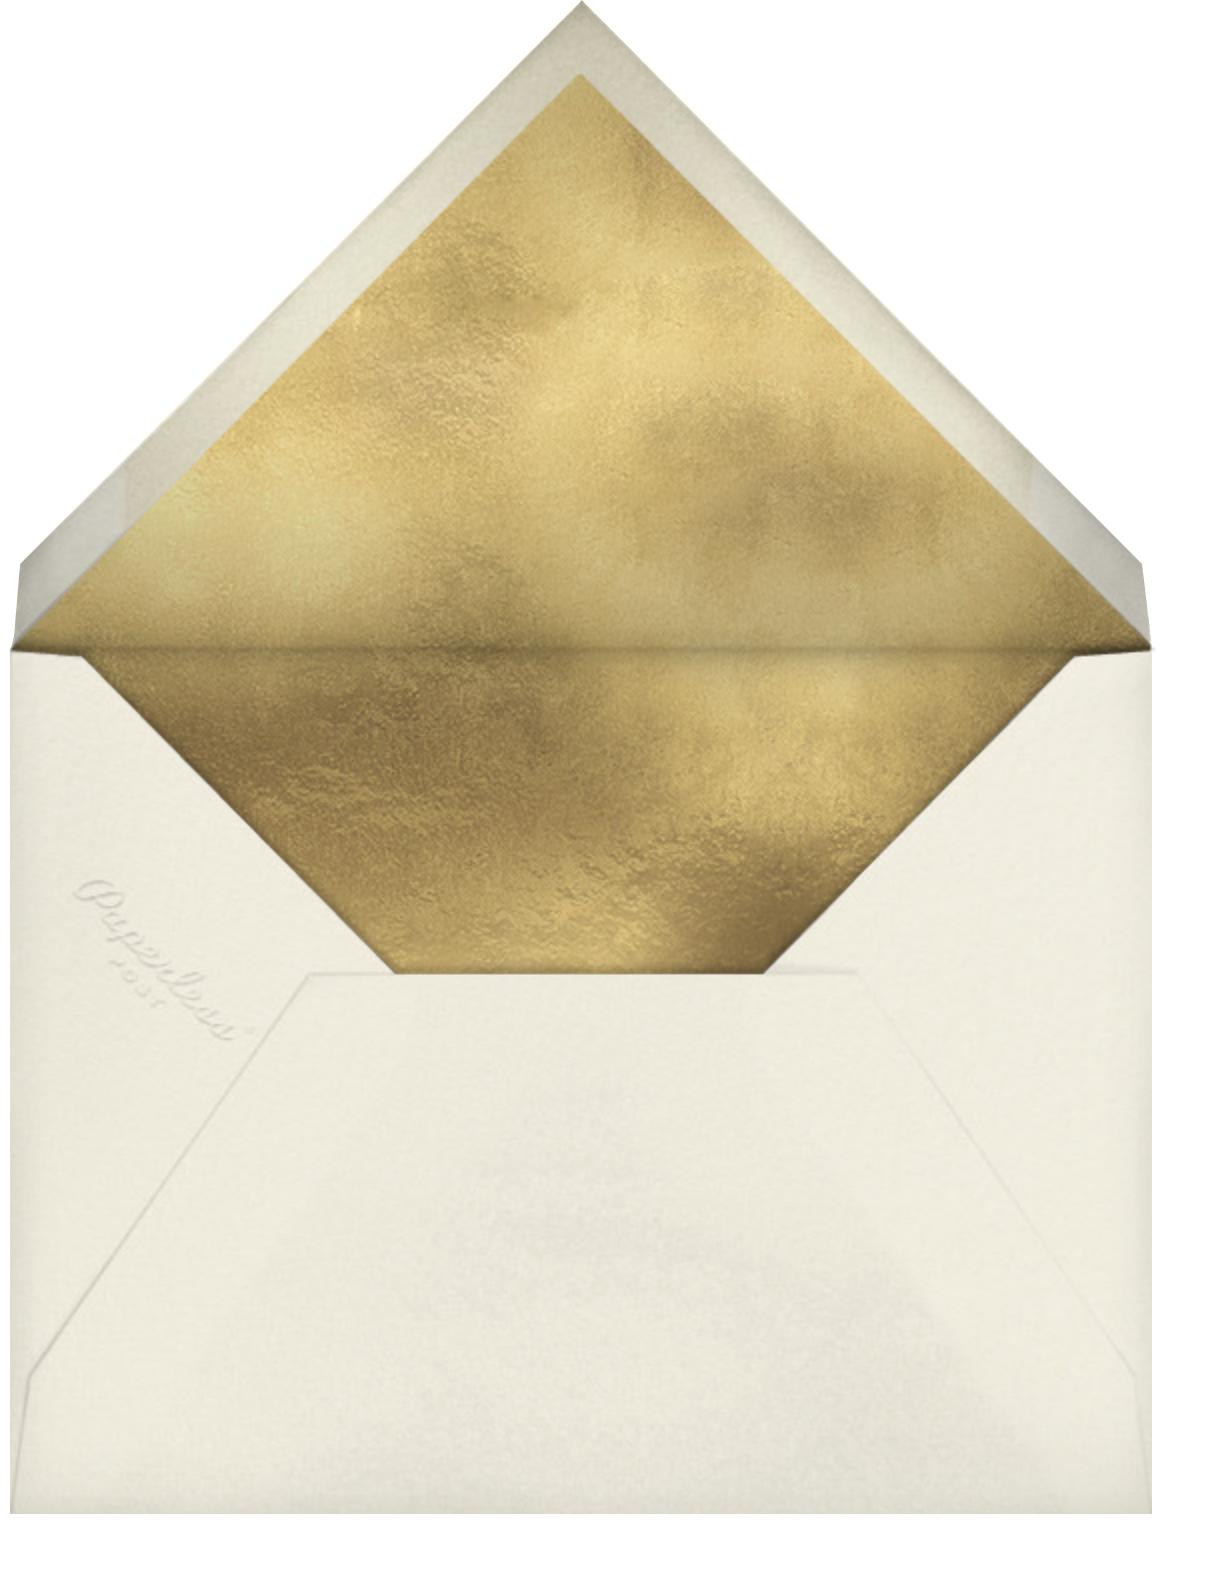 Of a Feather - Anthropologie - Bridal shower - envelope back